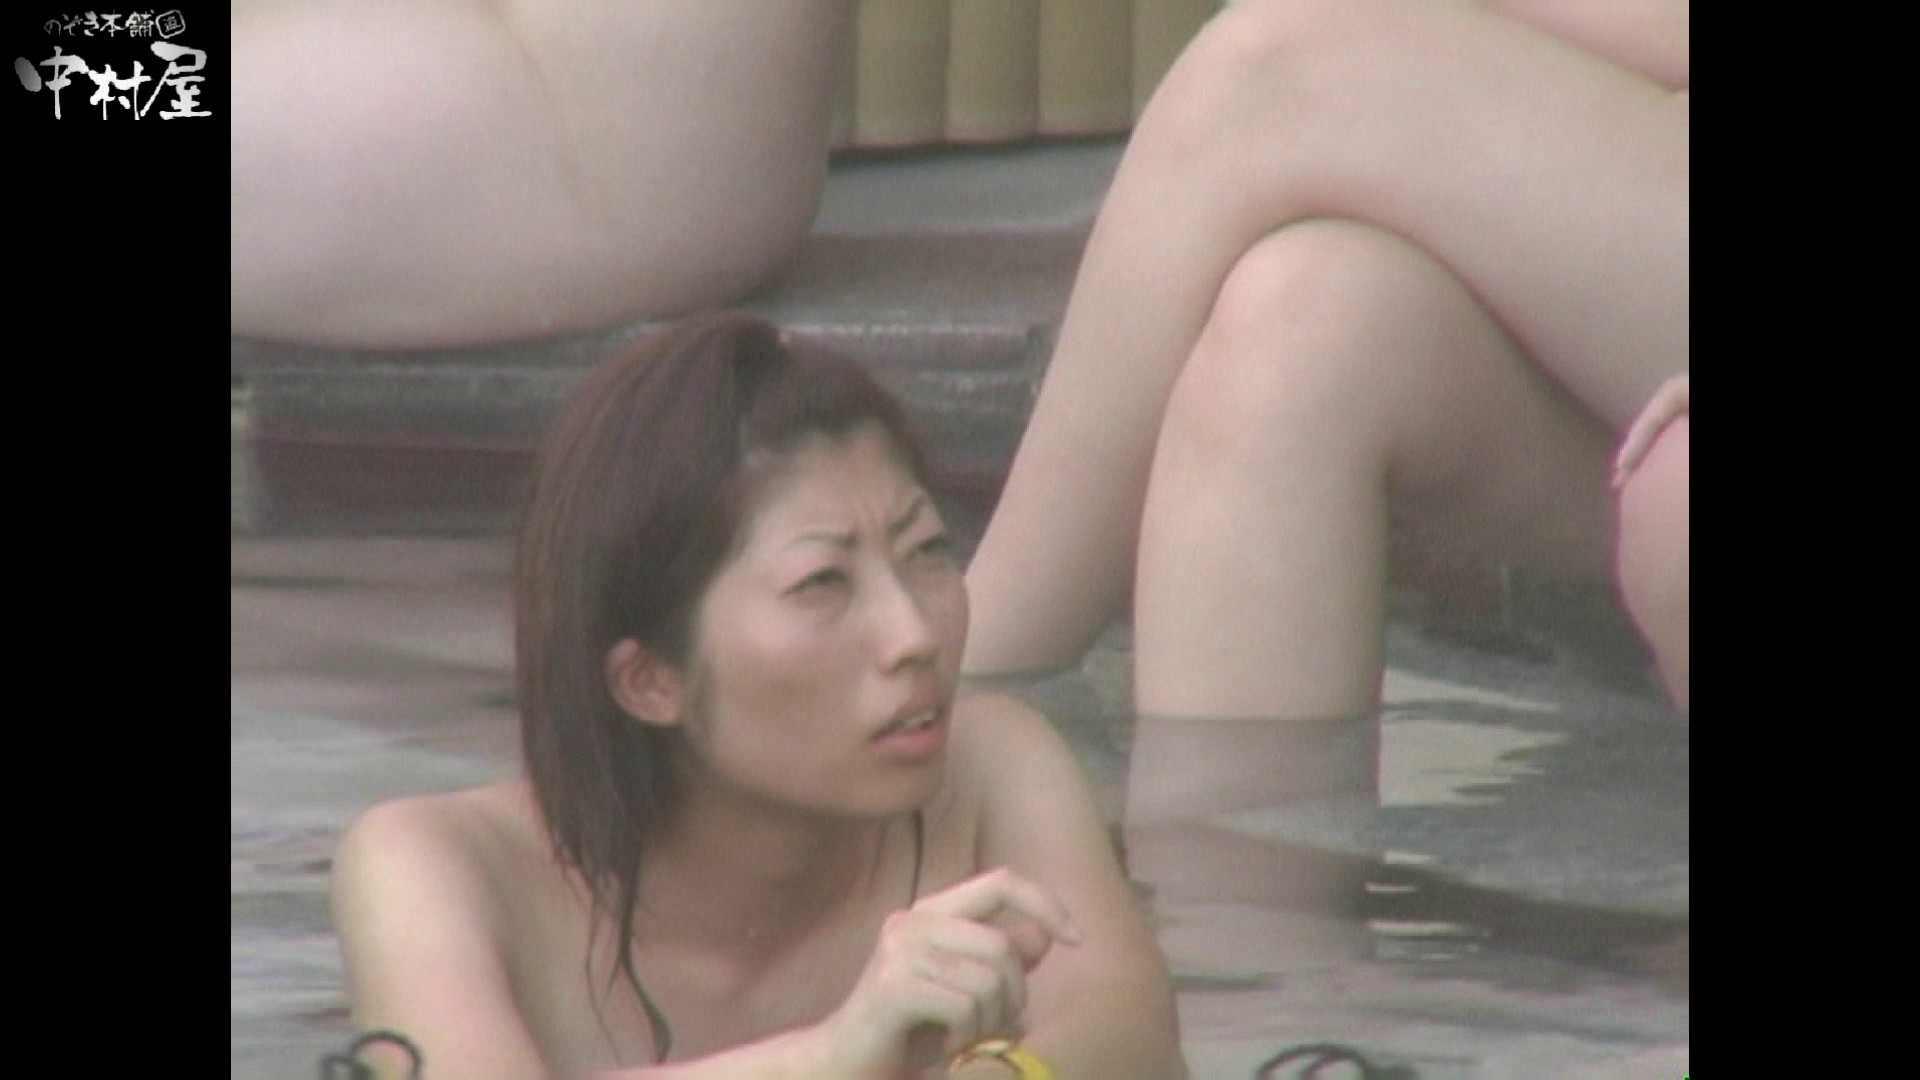 Aquaな露天風呂Vol.940 OLセックス | 露天  98画像 37